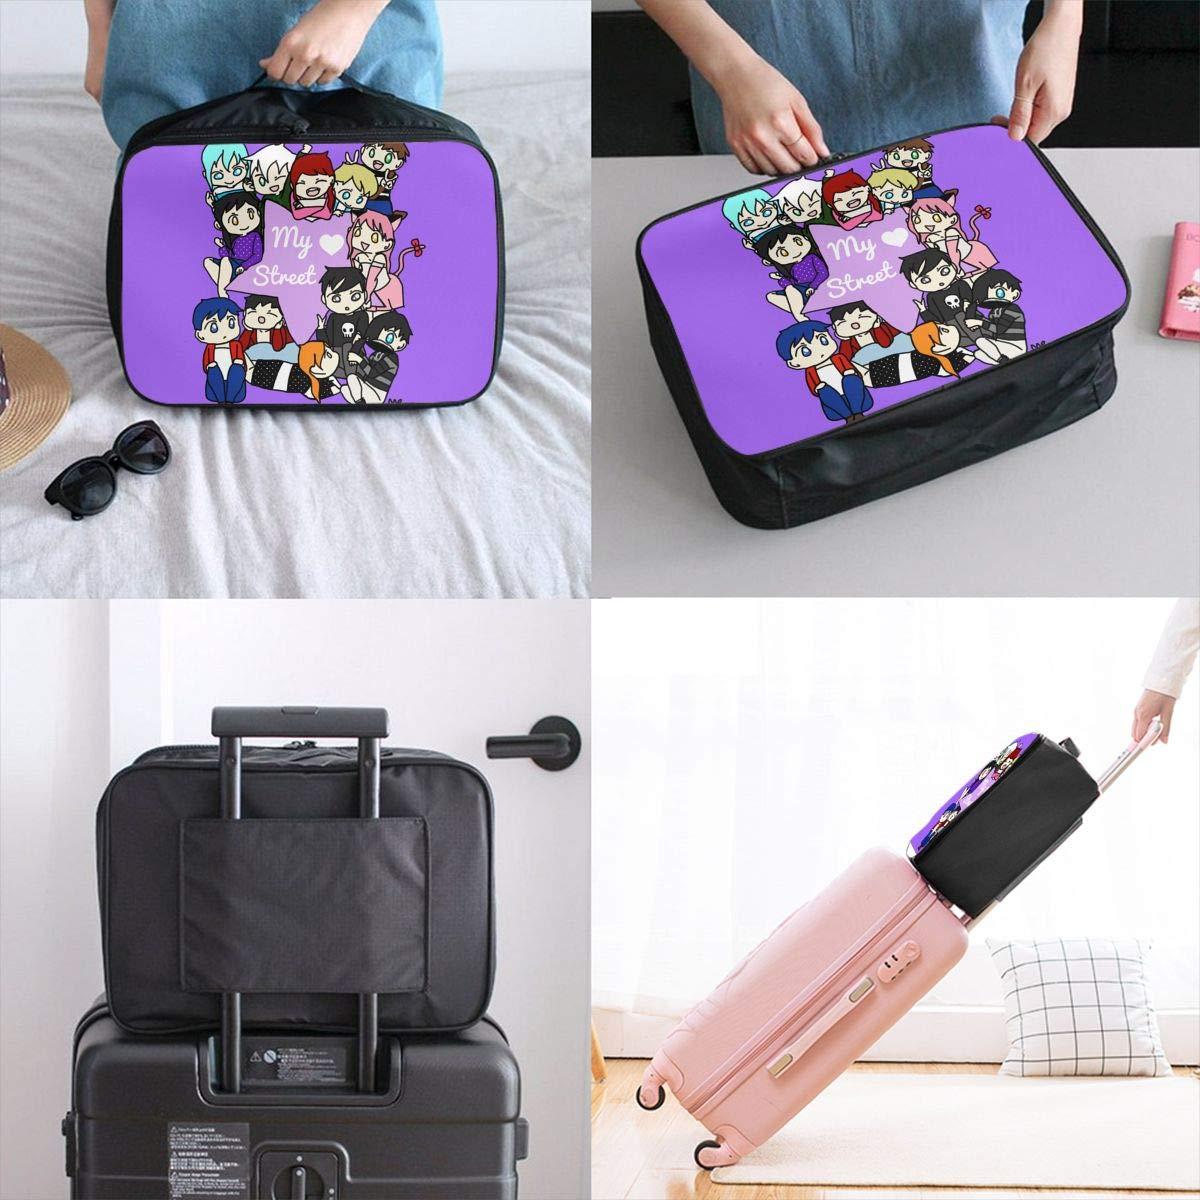 BOKAIKAI1306 Lovely Aphmau Unisex Adults Fashion Lightweight Large Capacity Portable Large Travel Duffel Bag Men Womens Luggage Bag 3D Printed Customized Boarding Box